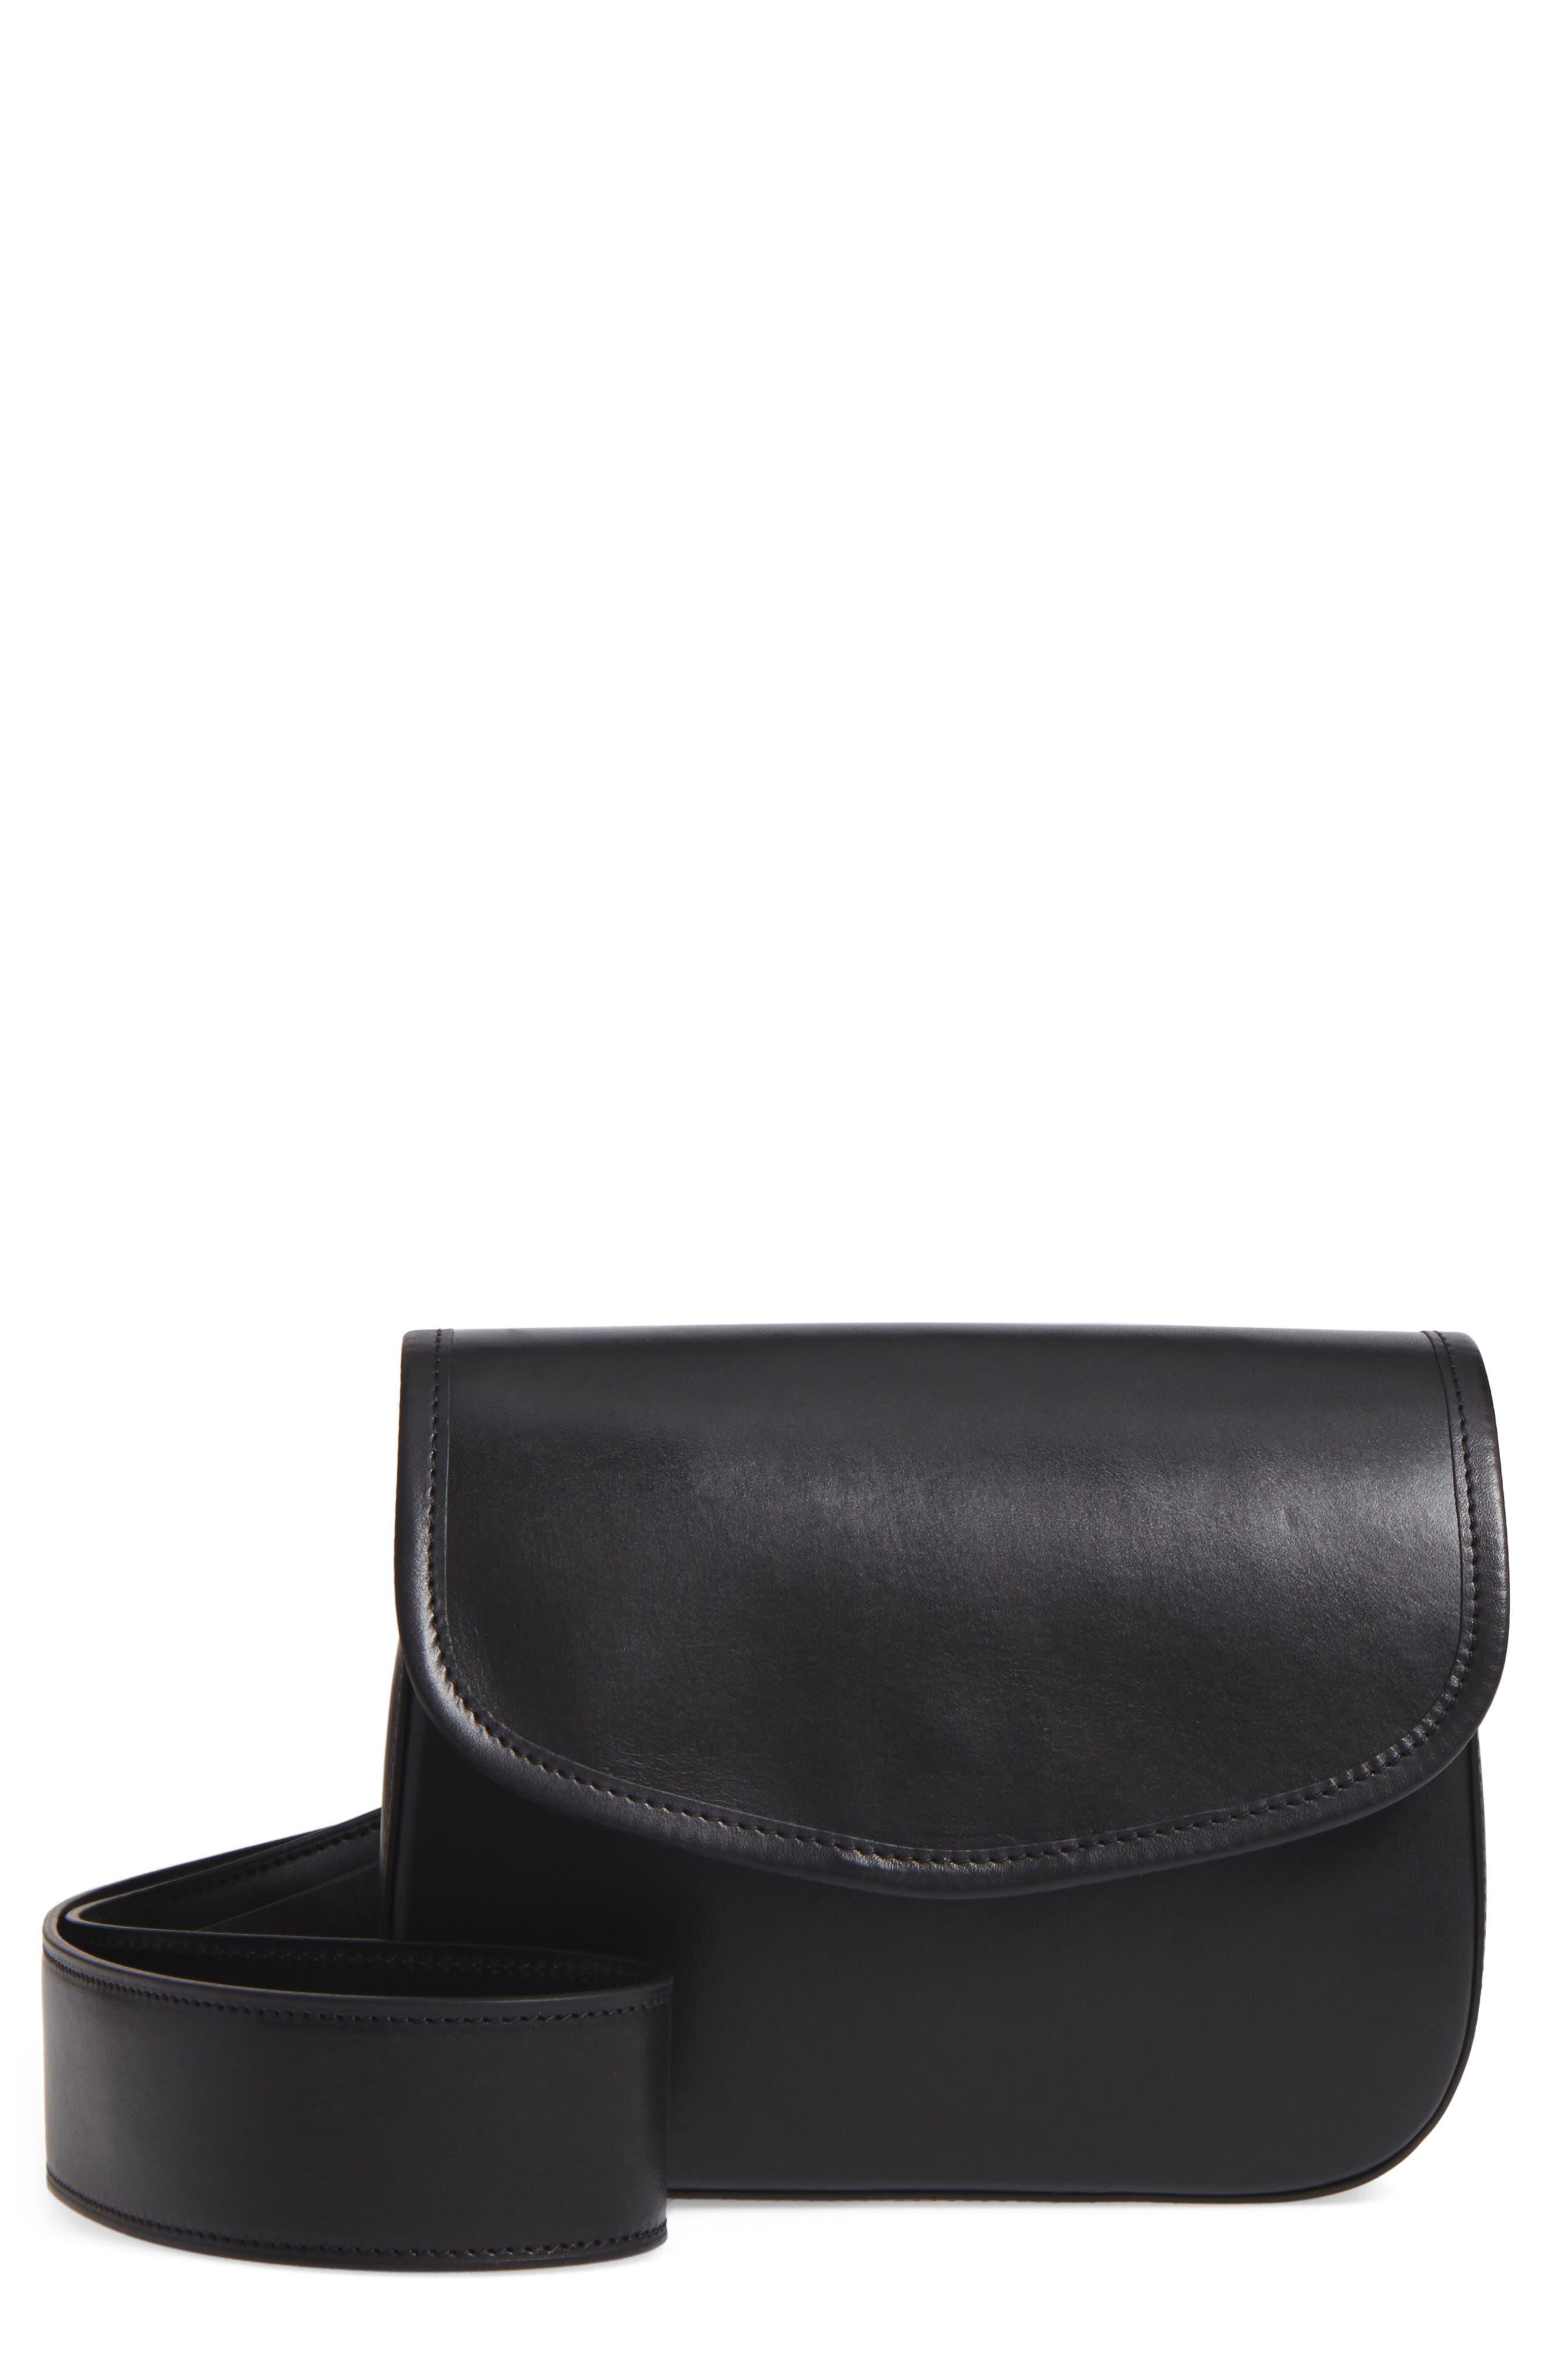 Simone Rocha Small Flap Crossbody Bag